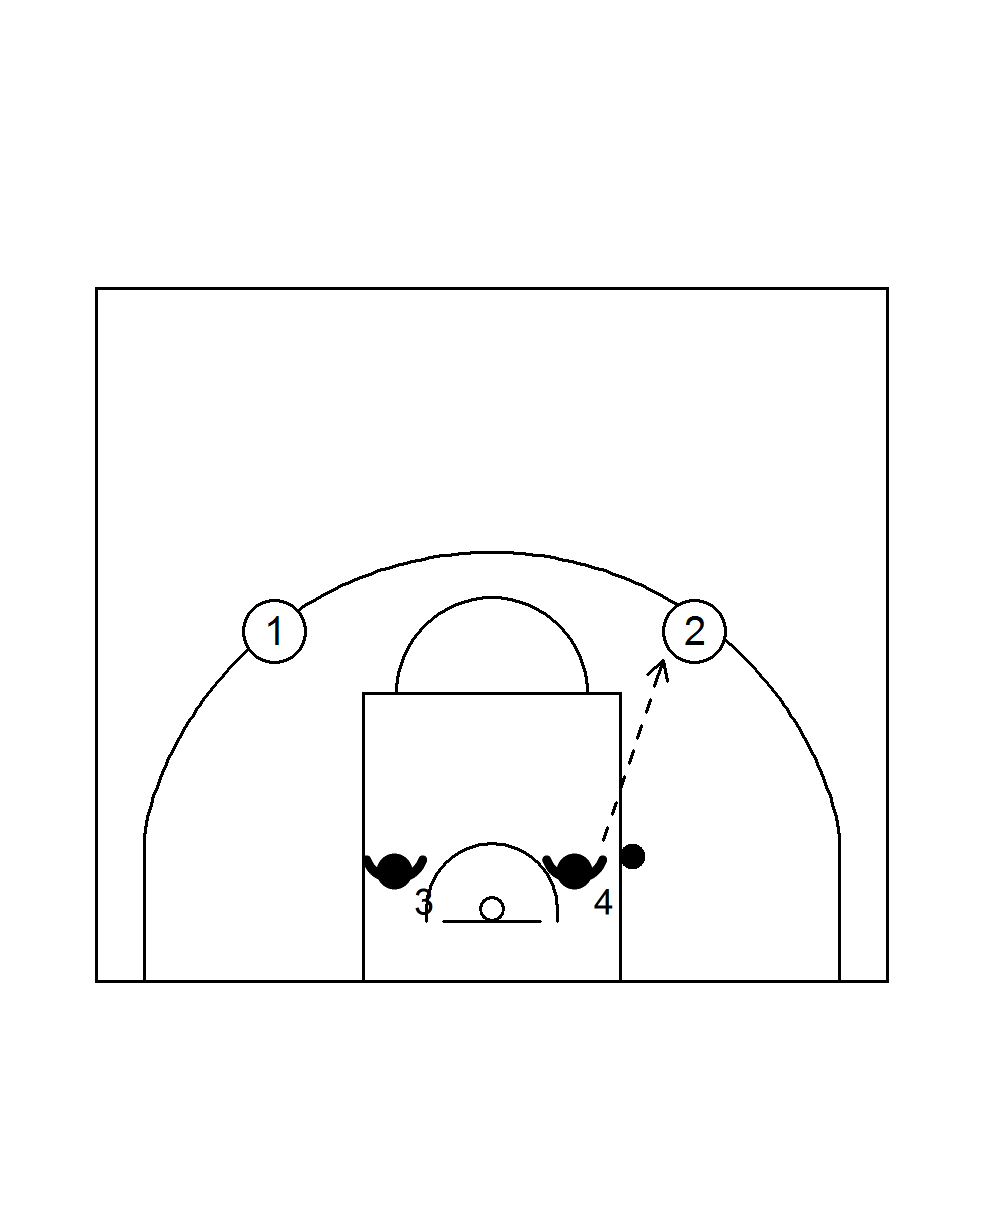 close-out-defense-2-2